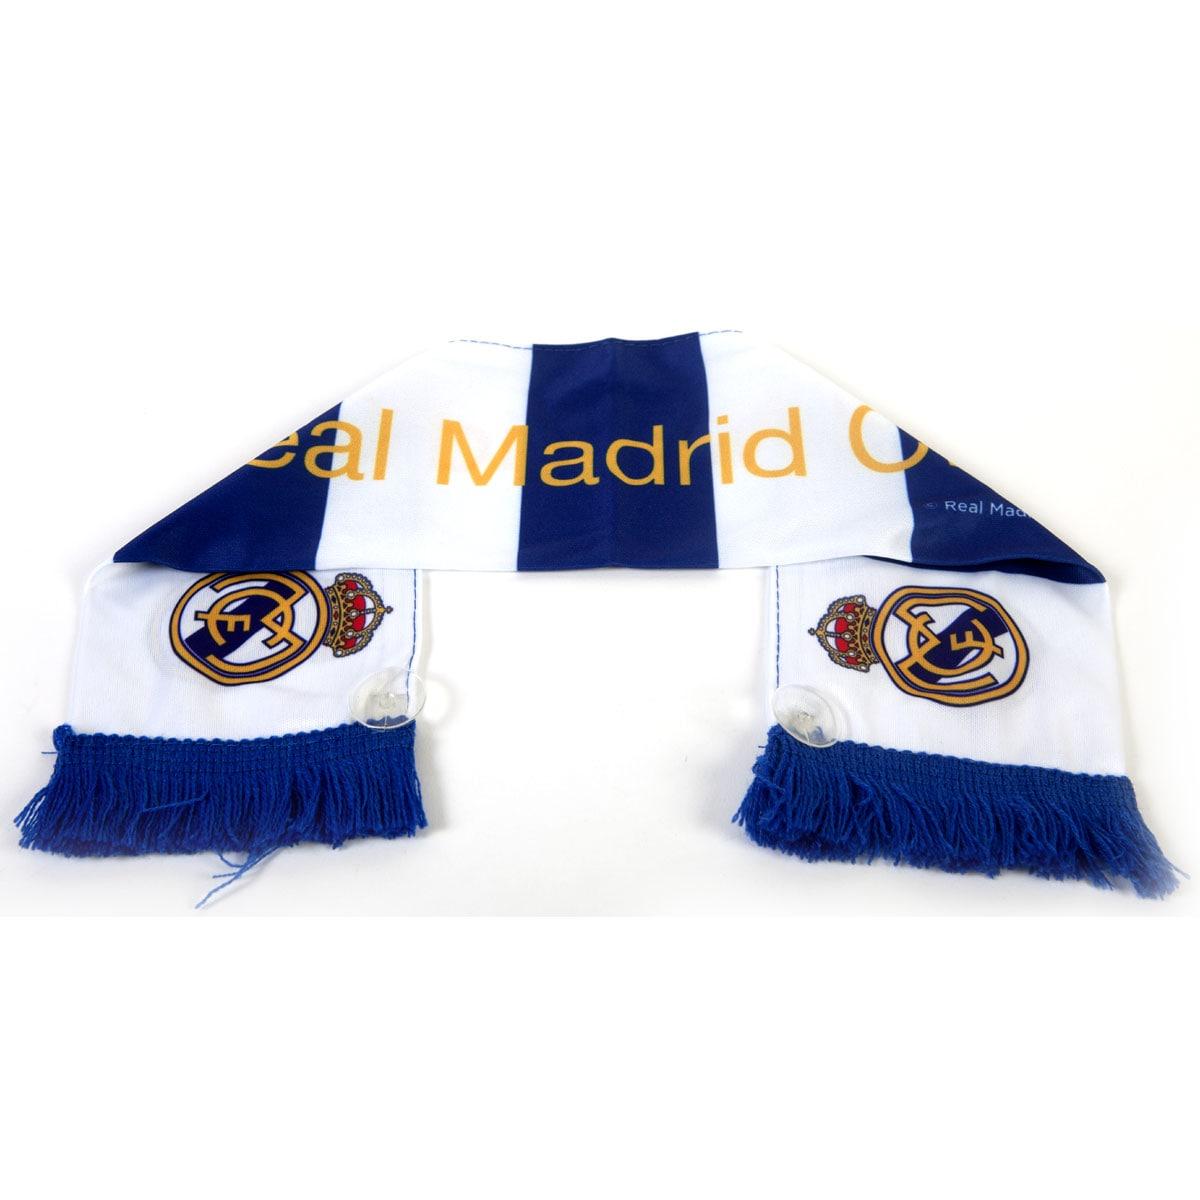 Real Madrid C.F. Mini Hanging Scarf - 1